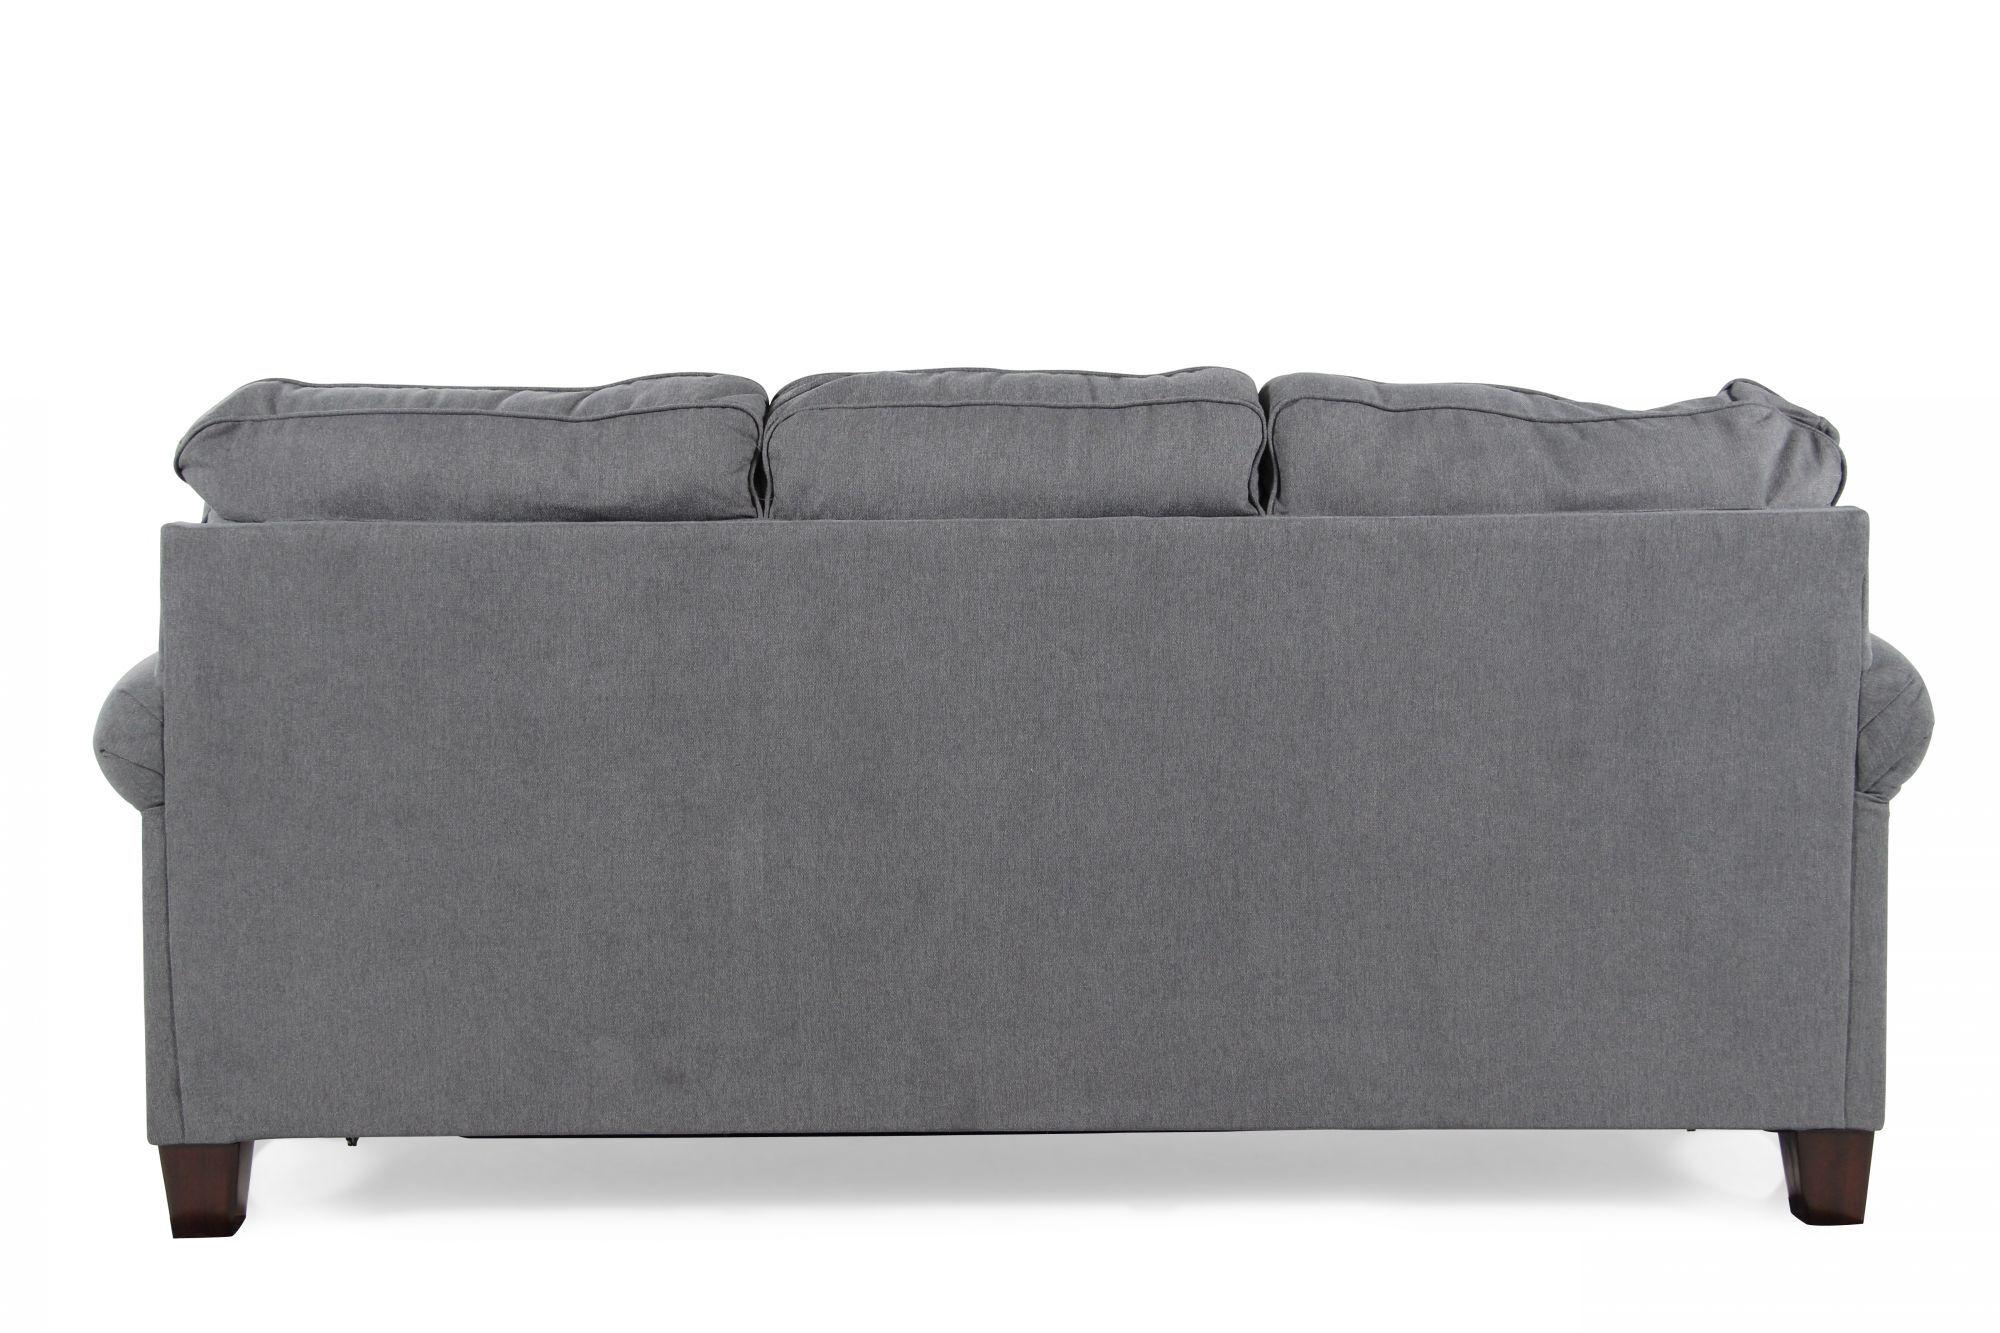 modern sleeper sofa under 1000 spring repair cost uk contemporary 78 quot full in denim blue mathis